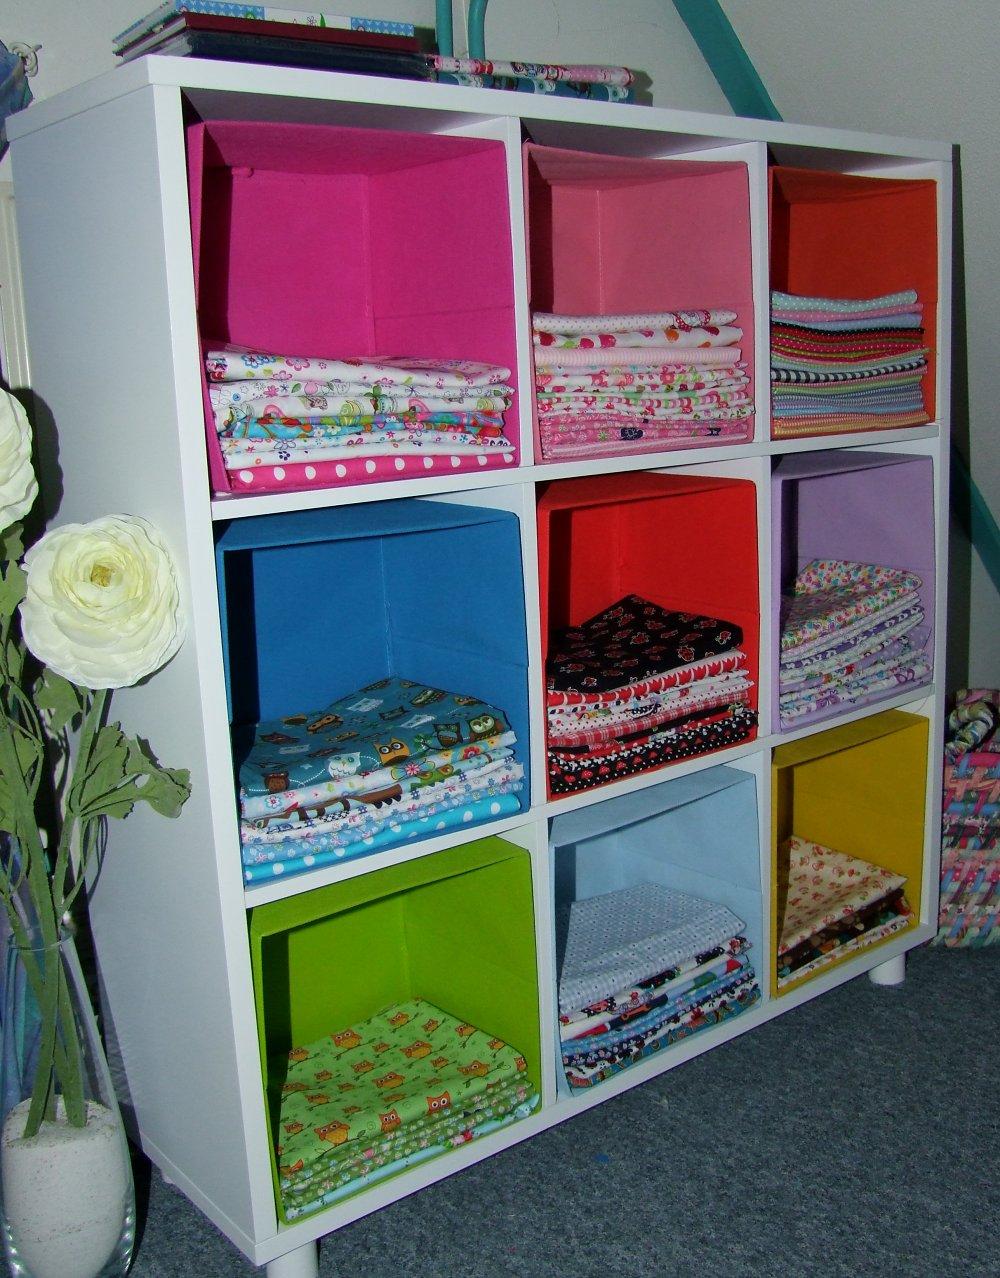 Pin Marktplaatsnl Ikea Rotan Bed Scandinavisch Riet Slaapkamer on Pinterest